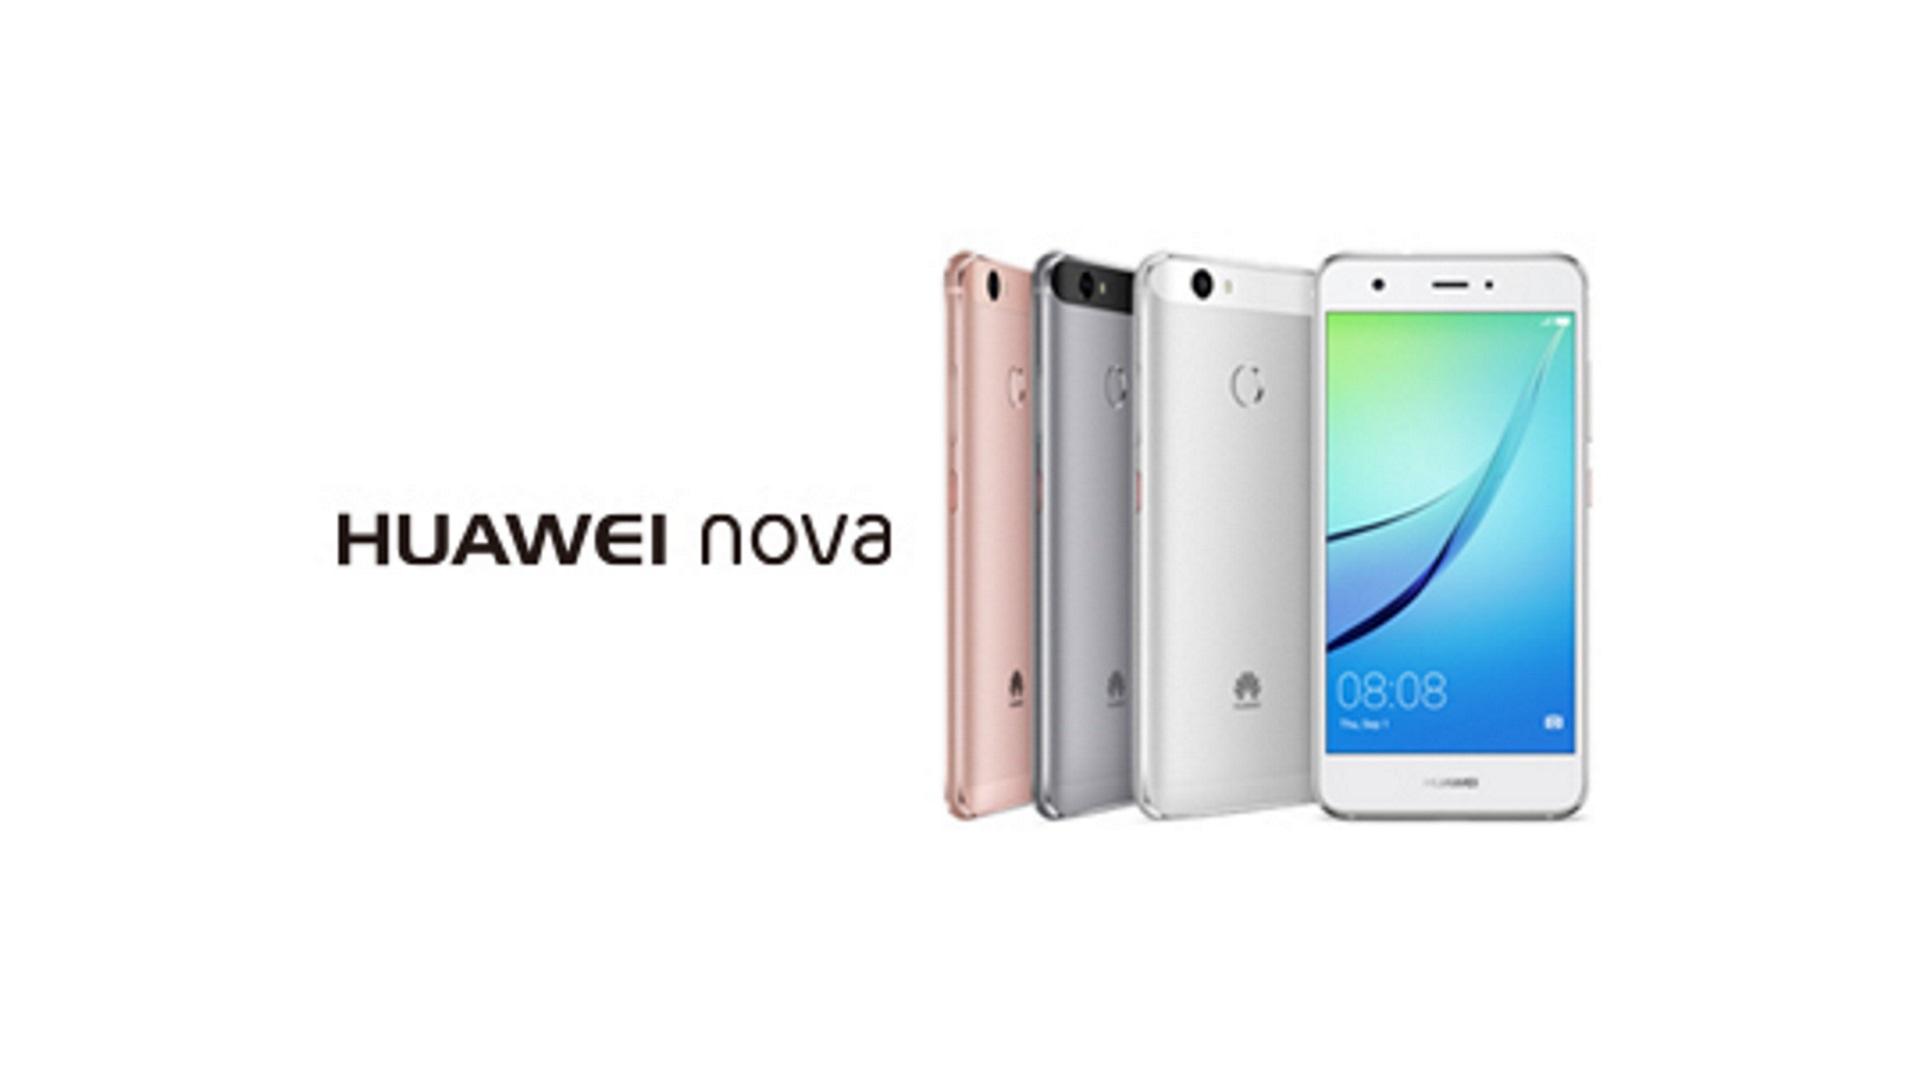 Huawei Japan、「Huawei nova」のAndroid 7.0(EMUI5.0)先行アップデートテスターを200名募集、アップデートは23日から